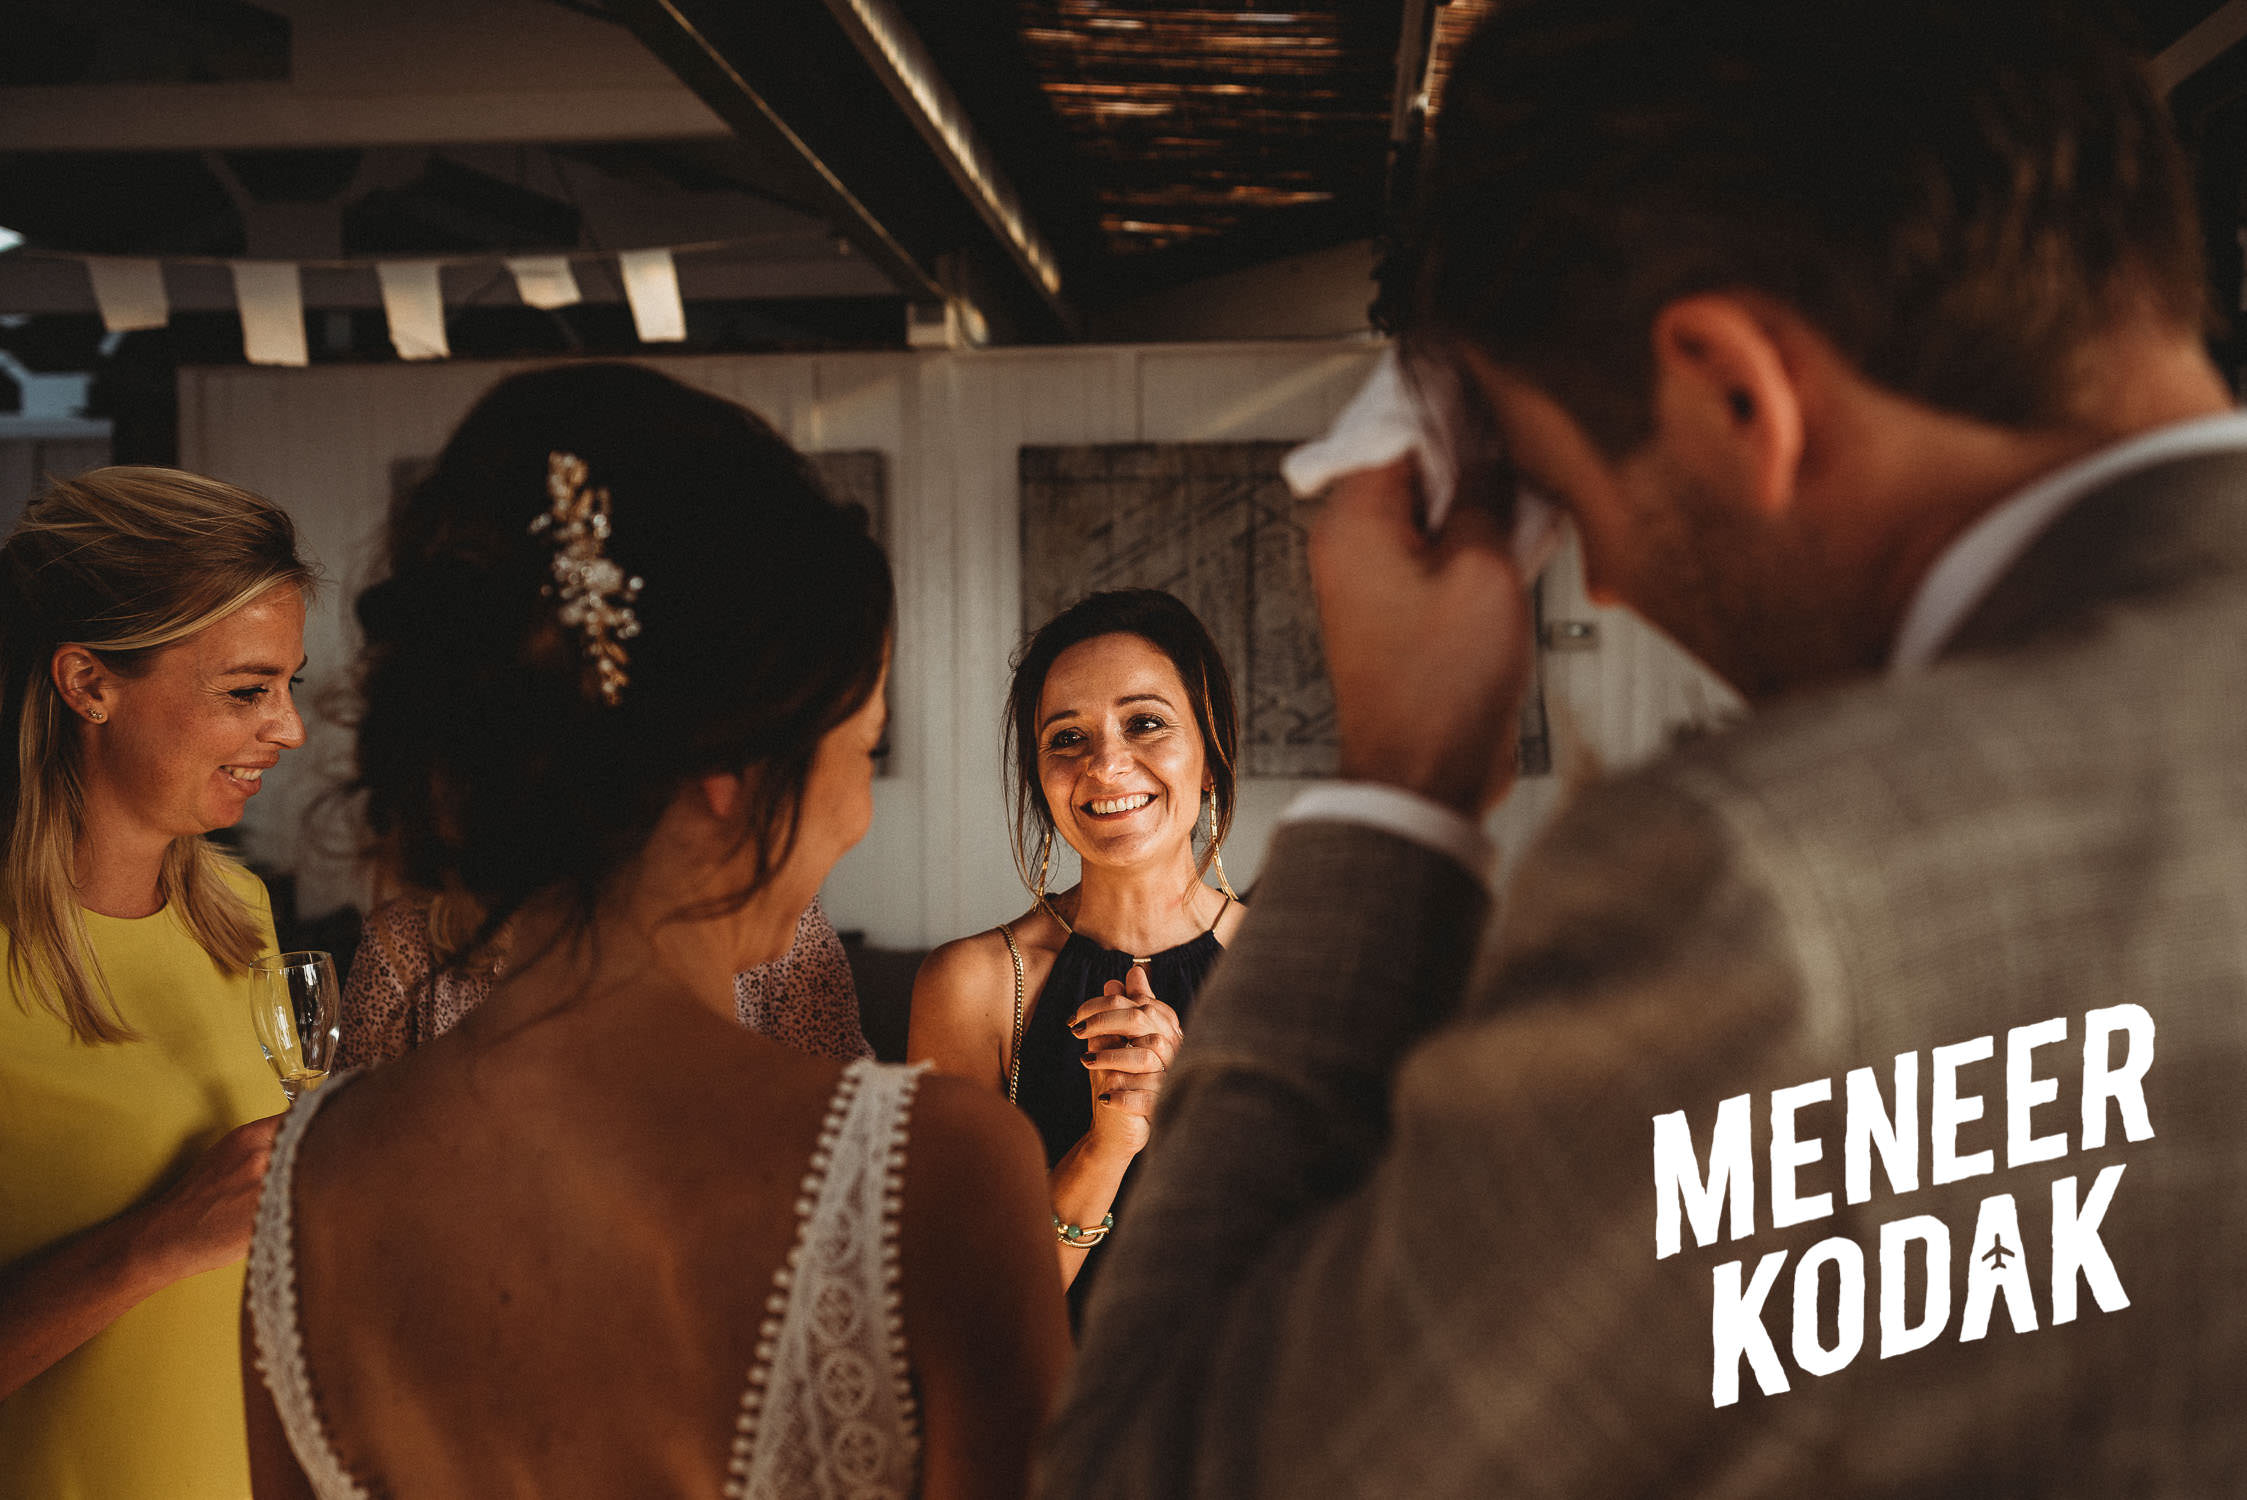 Meneer Kodak - Strandbruiloft - Noordwijk - K&A-109.jpg